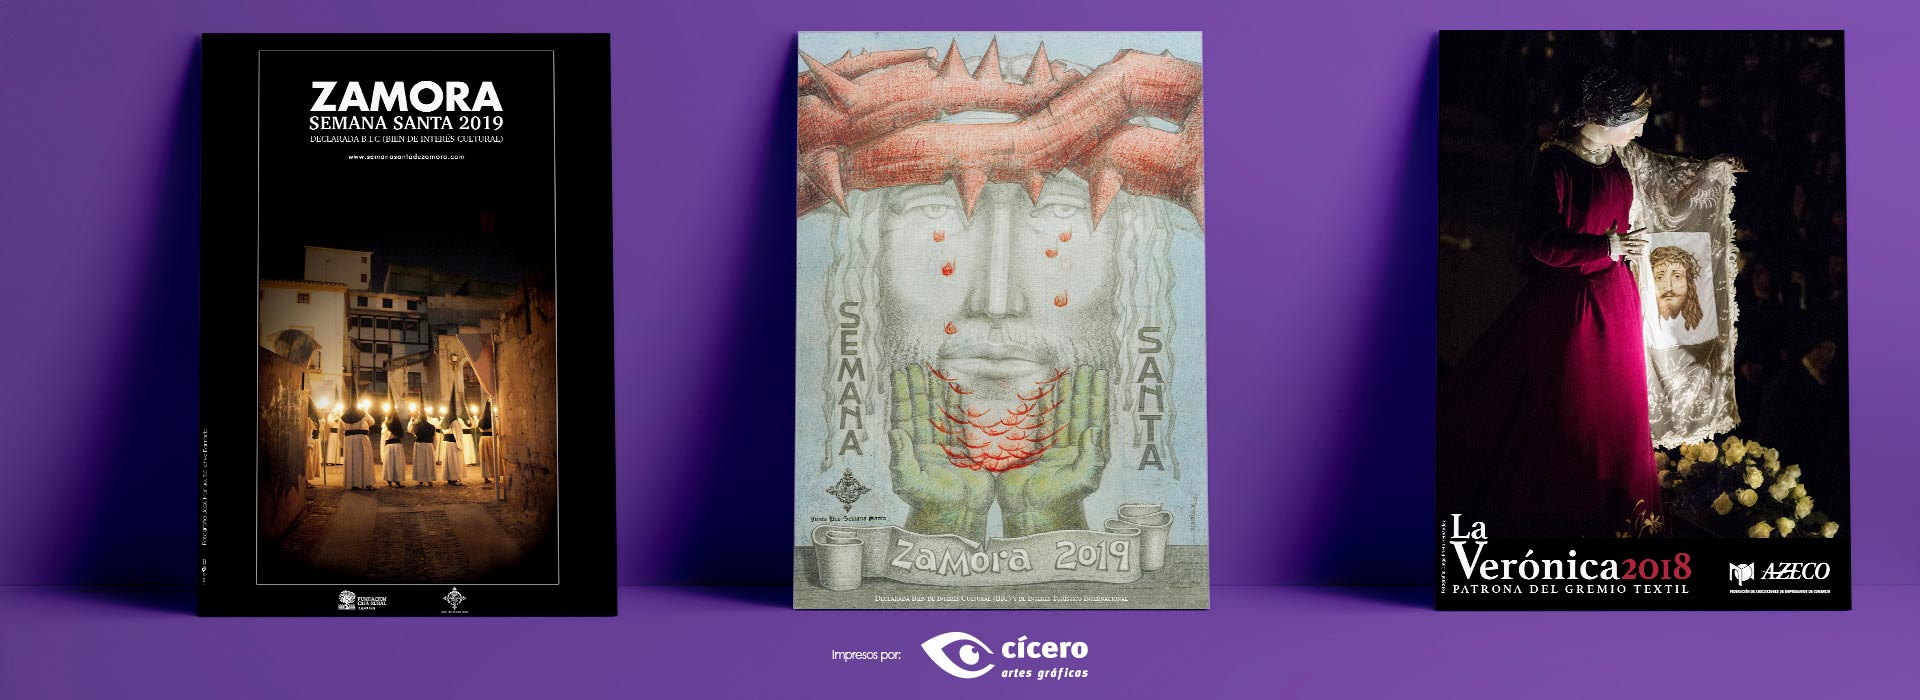 arteles Oficiales de Semana Santa de Zamora 2018. Impresos por Cícero Artes Gráficas 2019